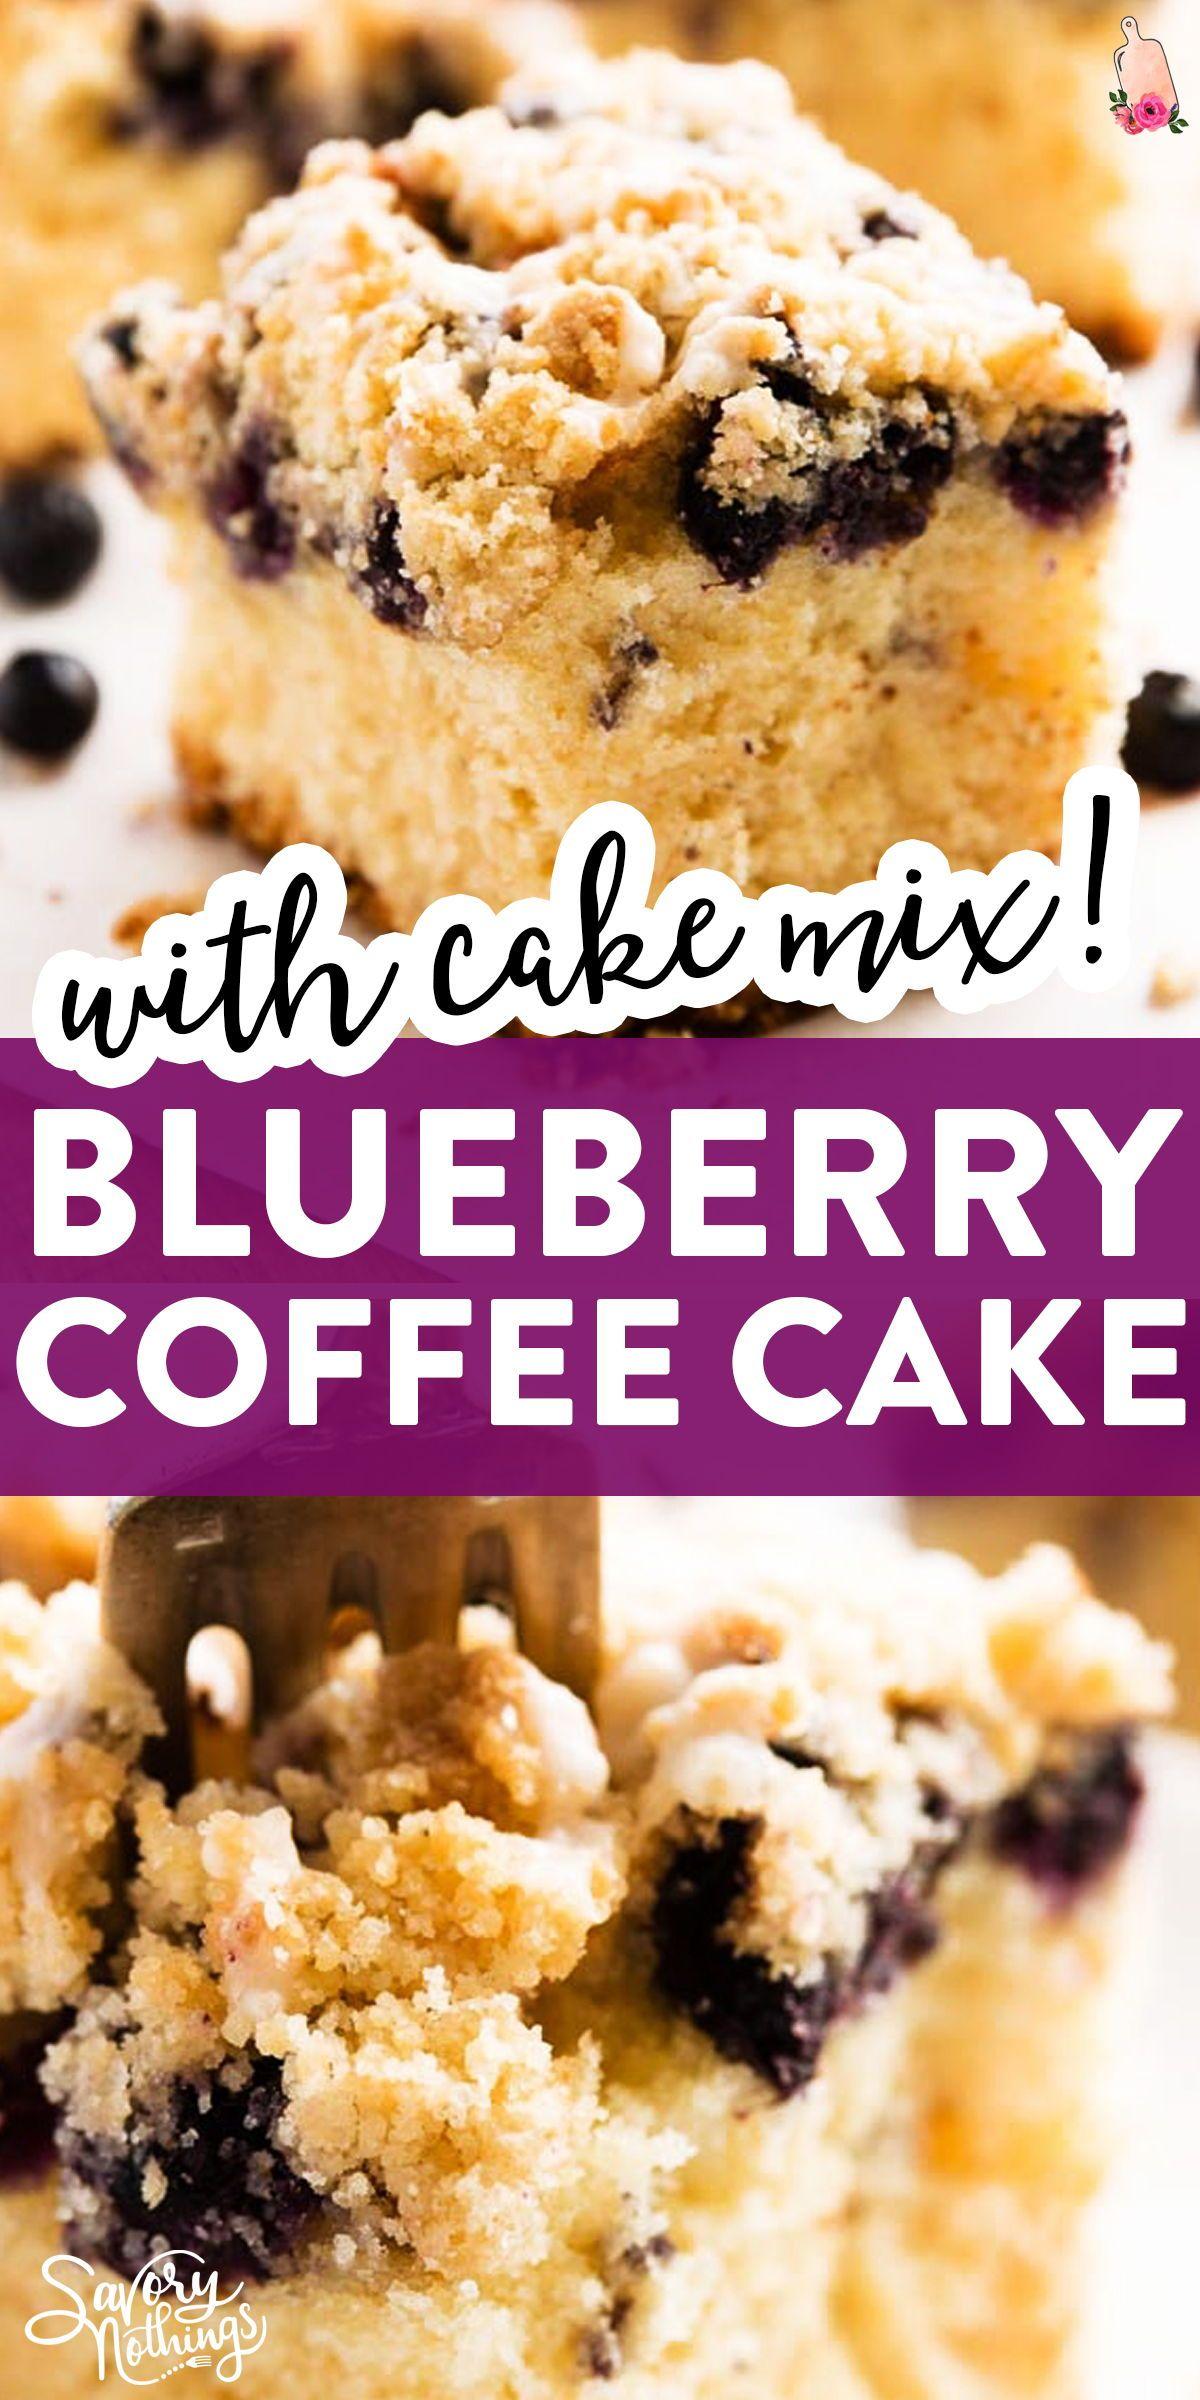 Lemon Blueberry Sour Cream Coffee Cake With Cake Mix In 2020 Blueberry Coffee Cake Recipe Blueberry Sour Cream Cake Coffee Cake Recipes Easy